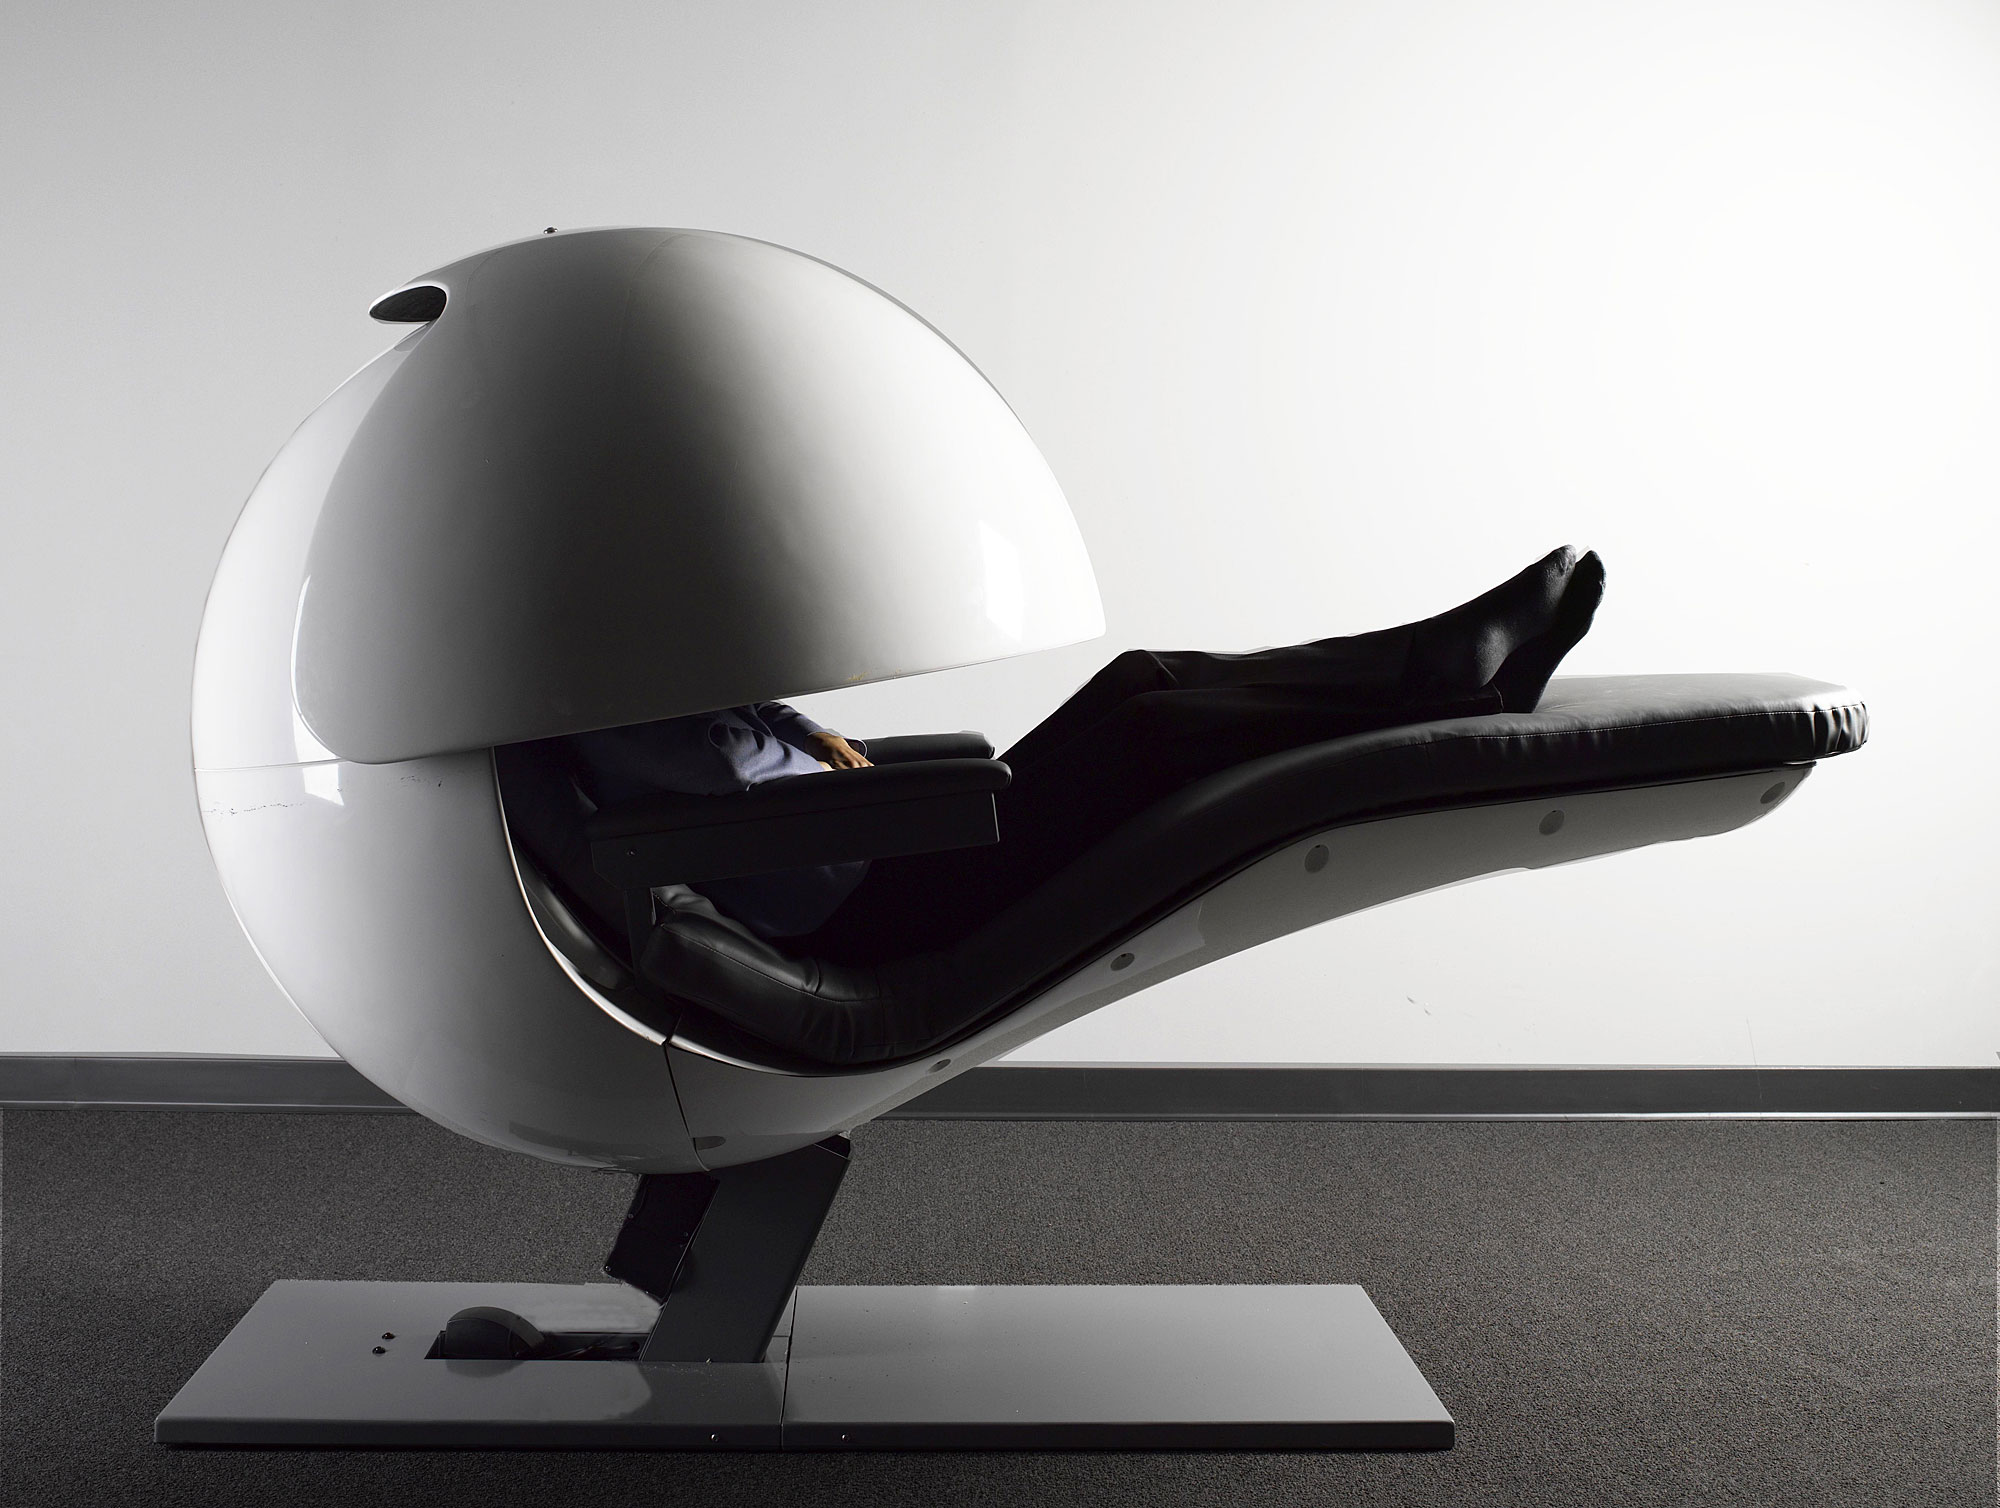 metronaps energypod nap chair (7)